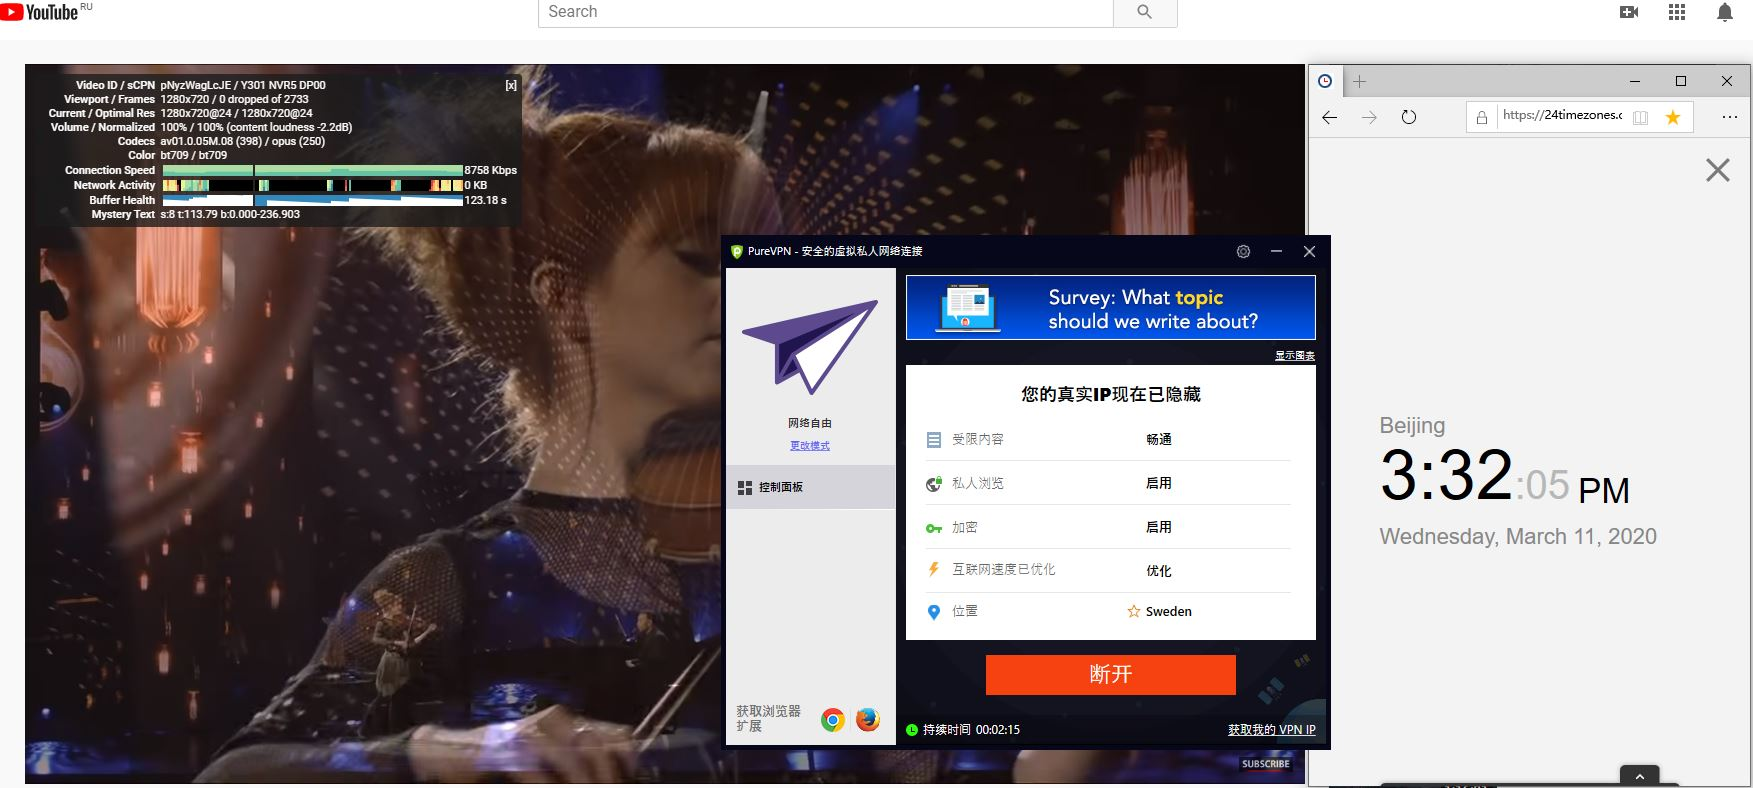 Windows10 PureVPN Russia 中国VPN翻墙 科学上网 SpeedTest测速 - 20200311